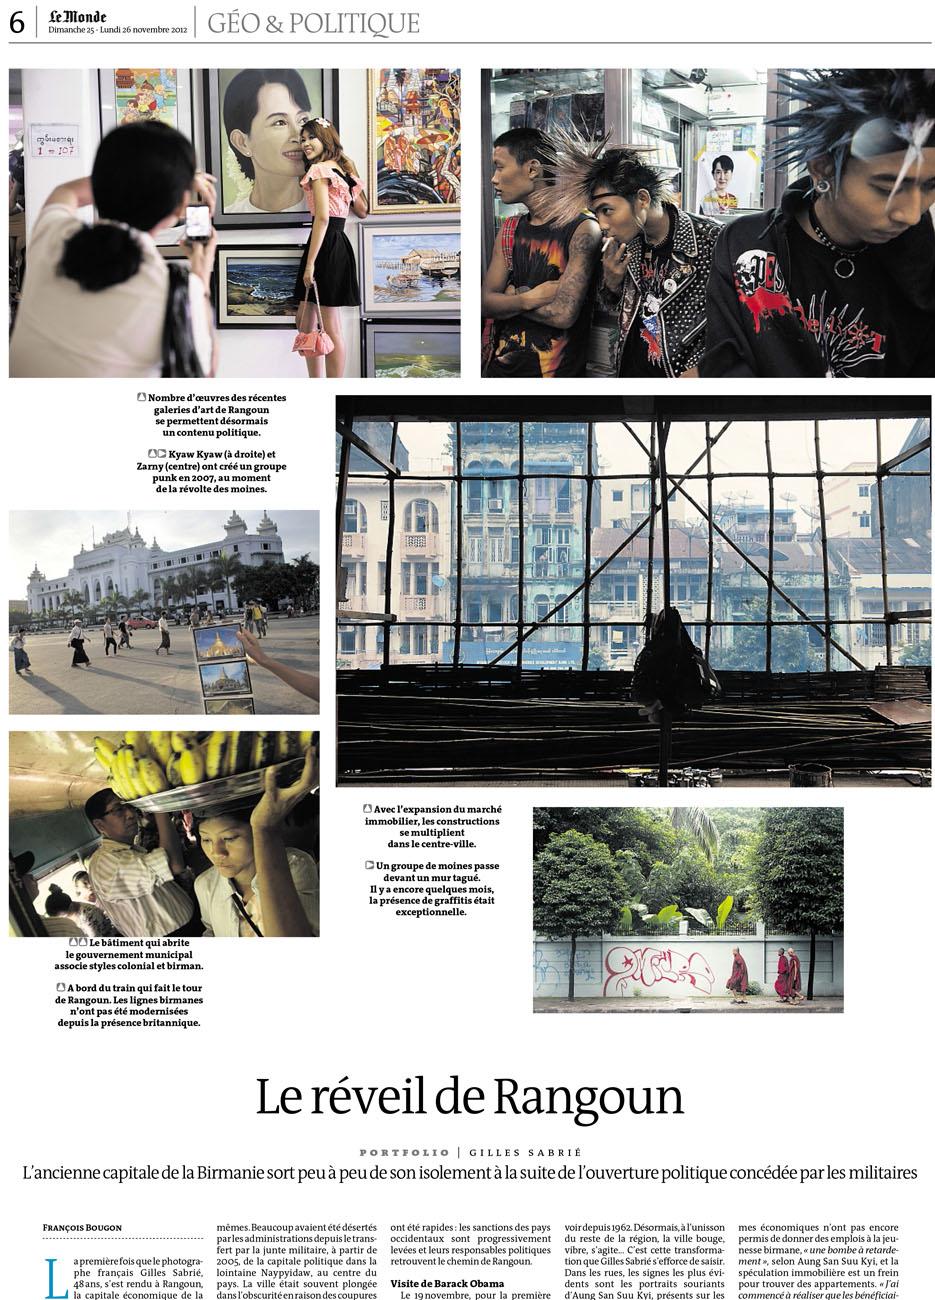 Cahier geo & politique du 25-26 novembre 2012-6.jpg